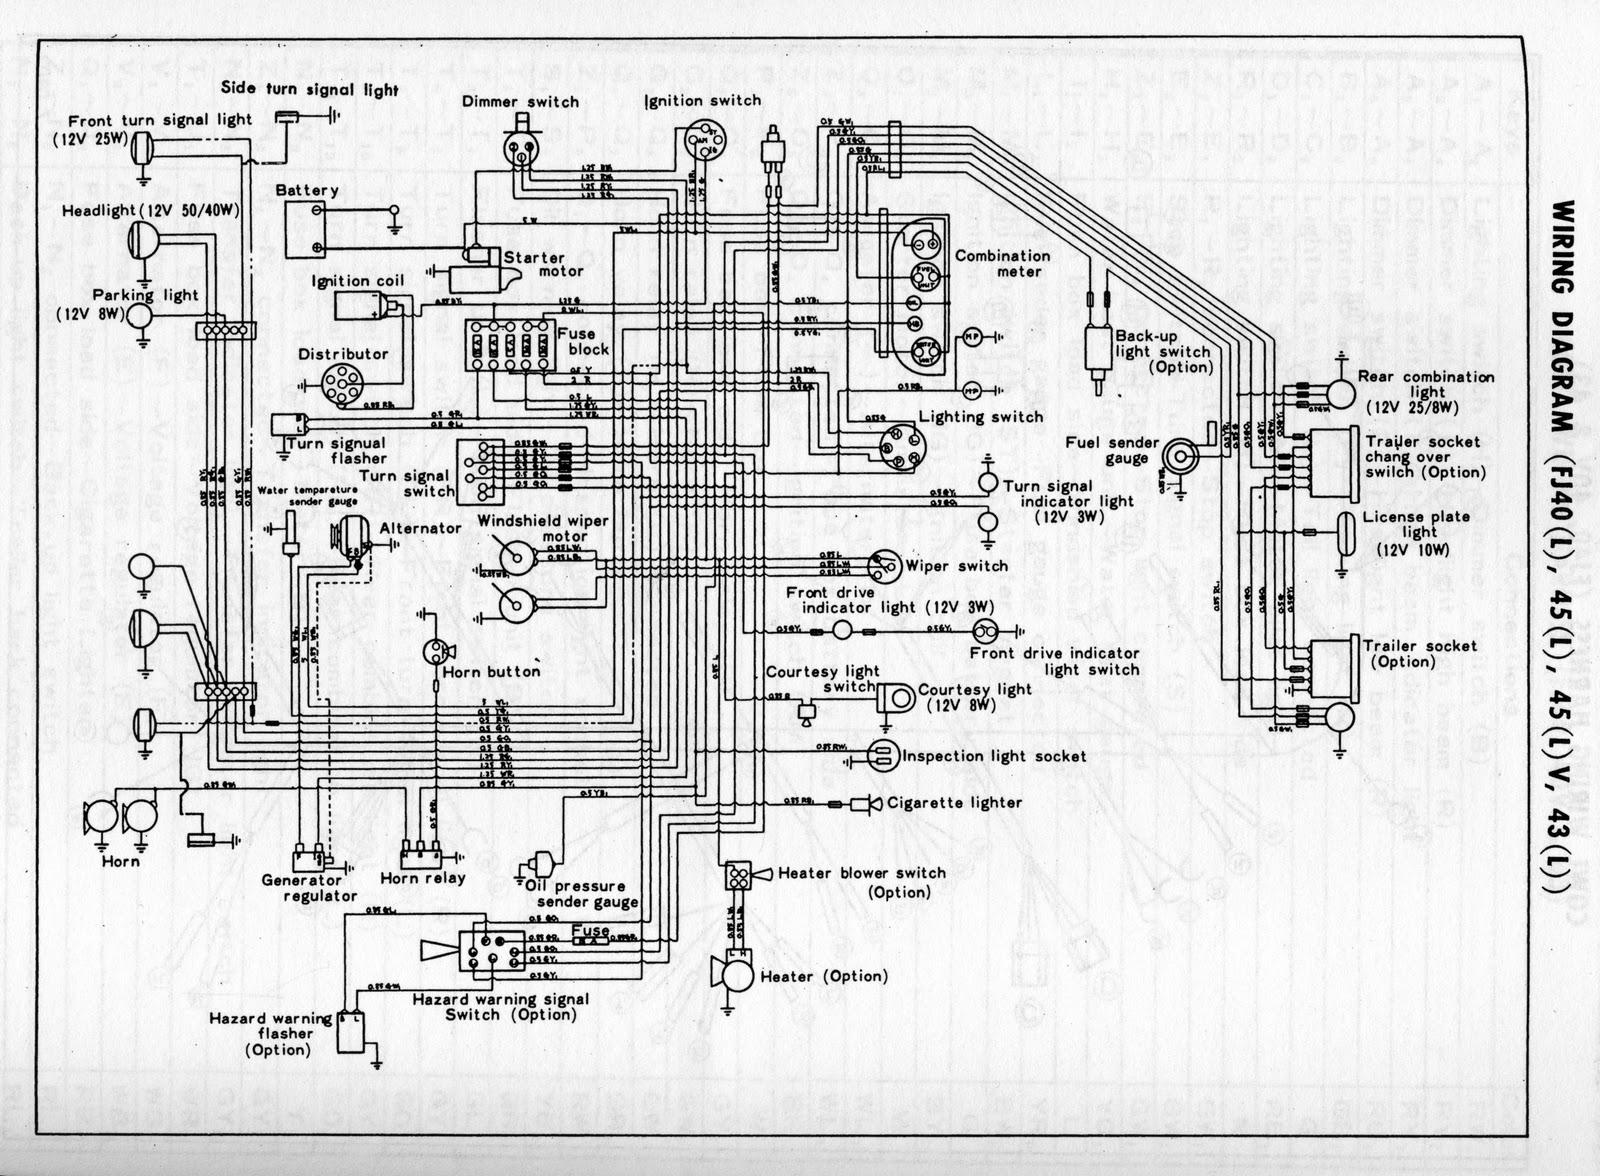 2003 big dog wiring diagram